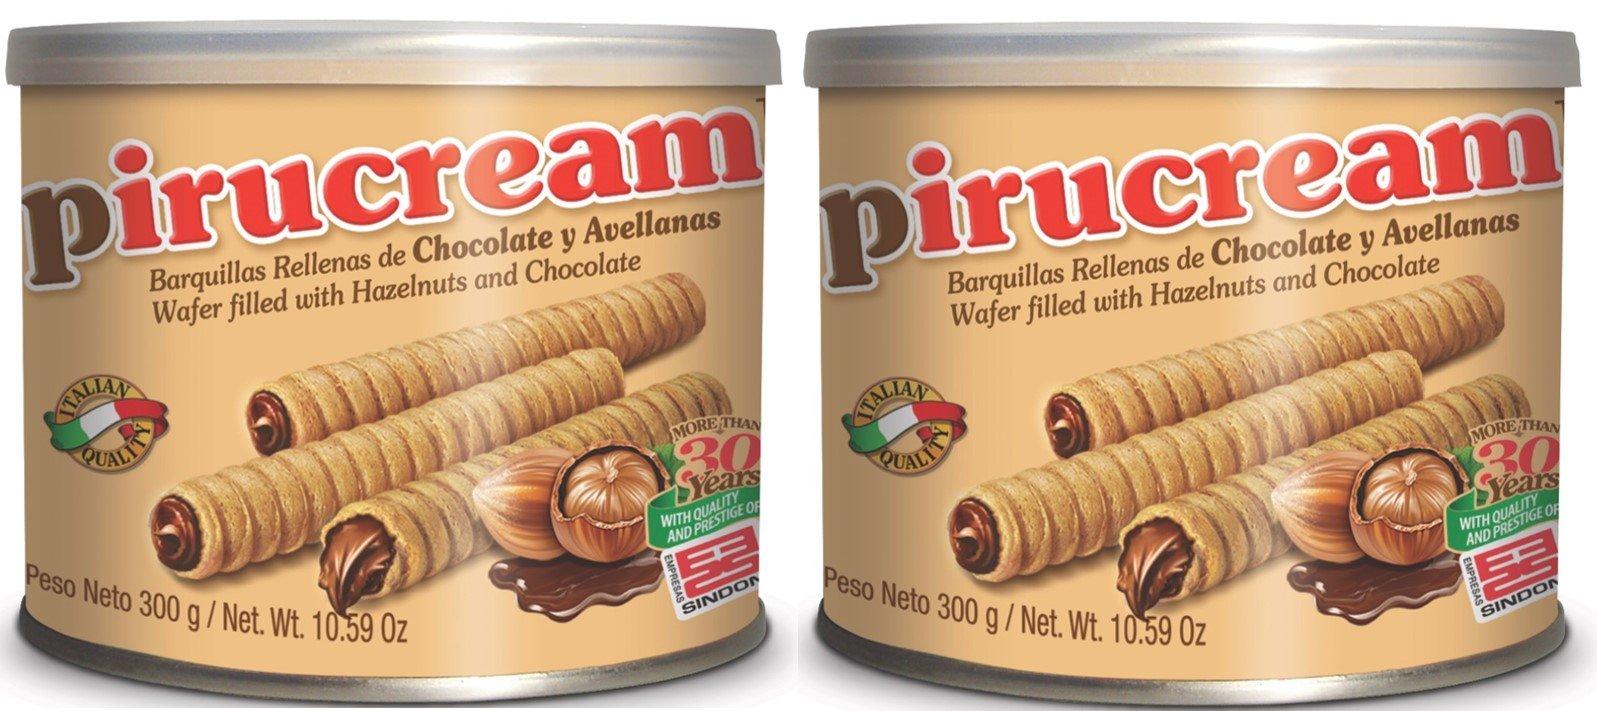 2 Pack Pirucream Chocolate and Hazelnut Wafer 10.59oz by Pirucream